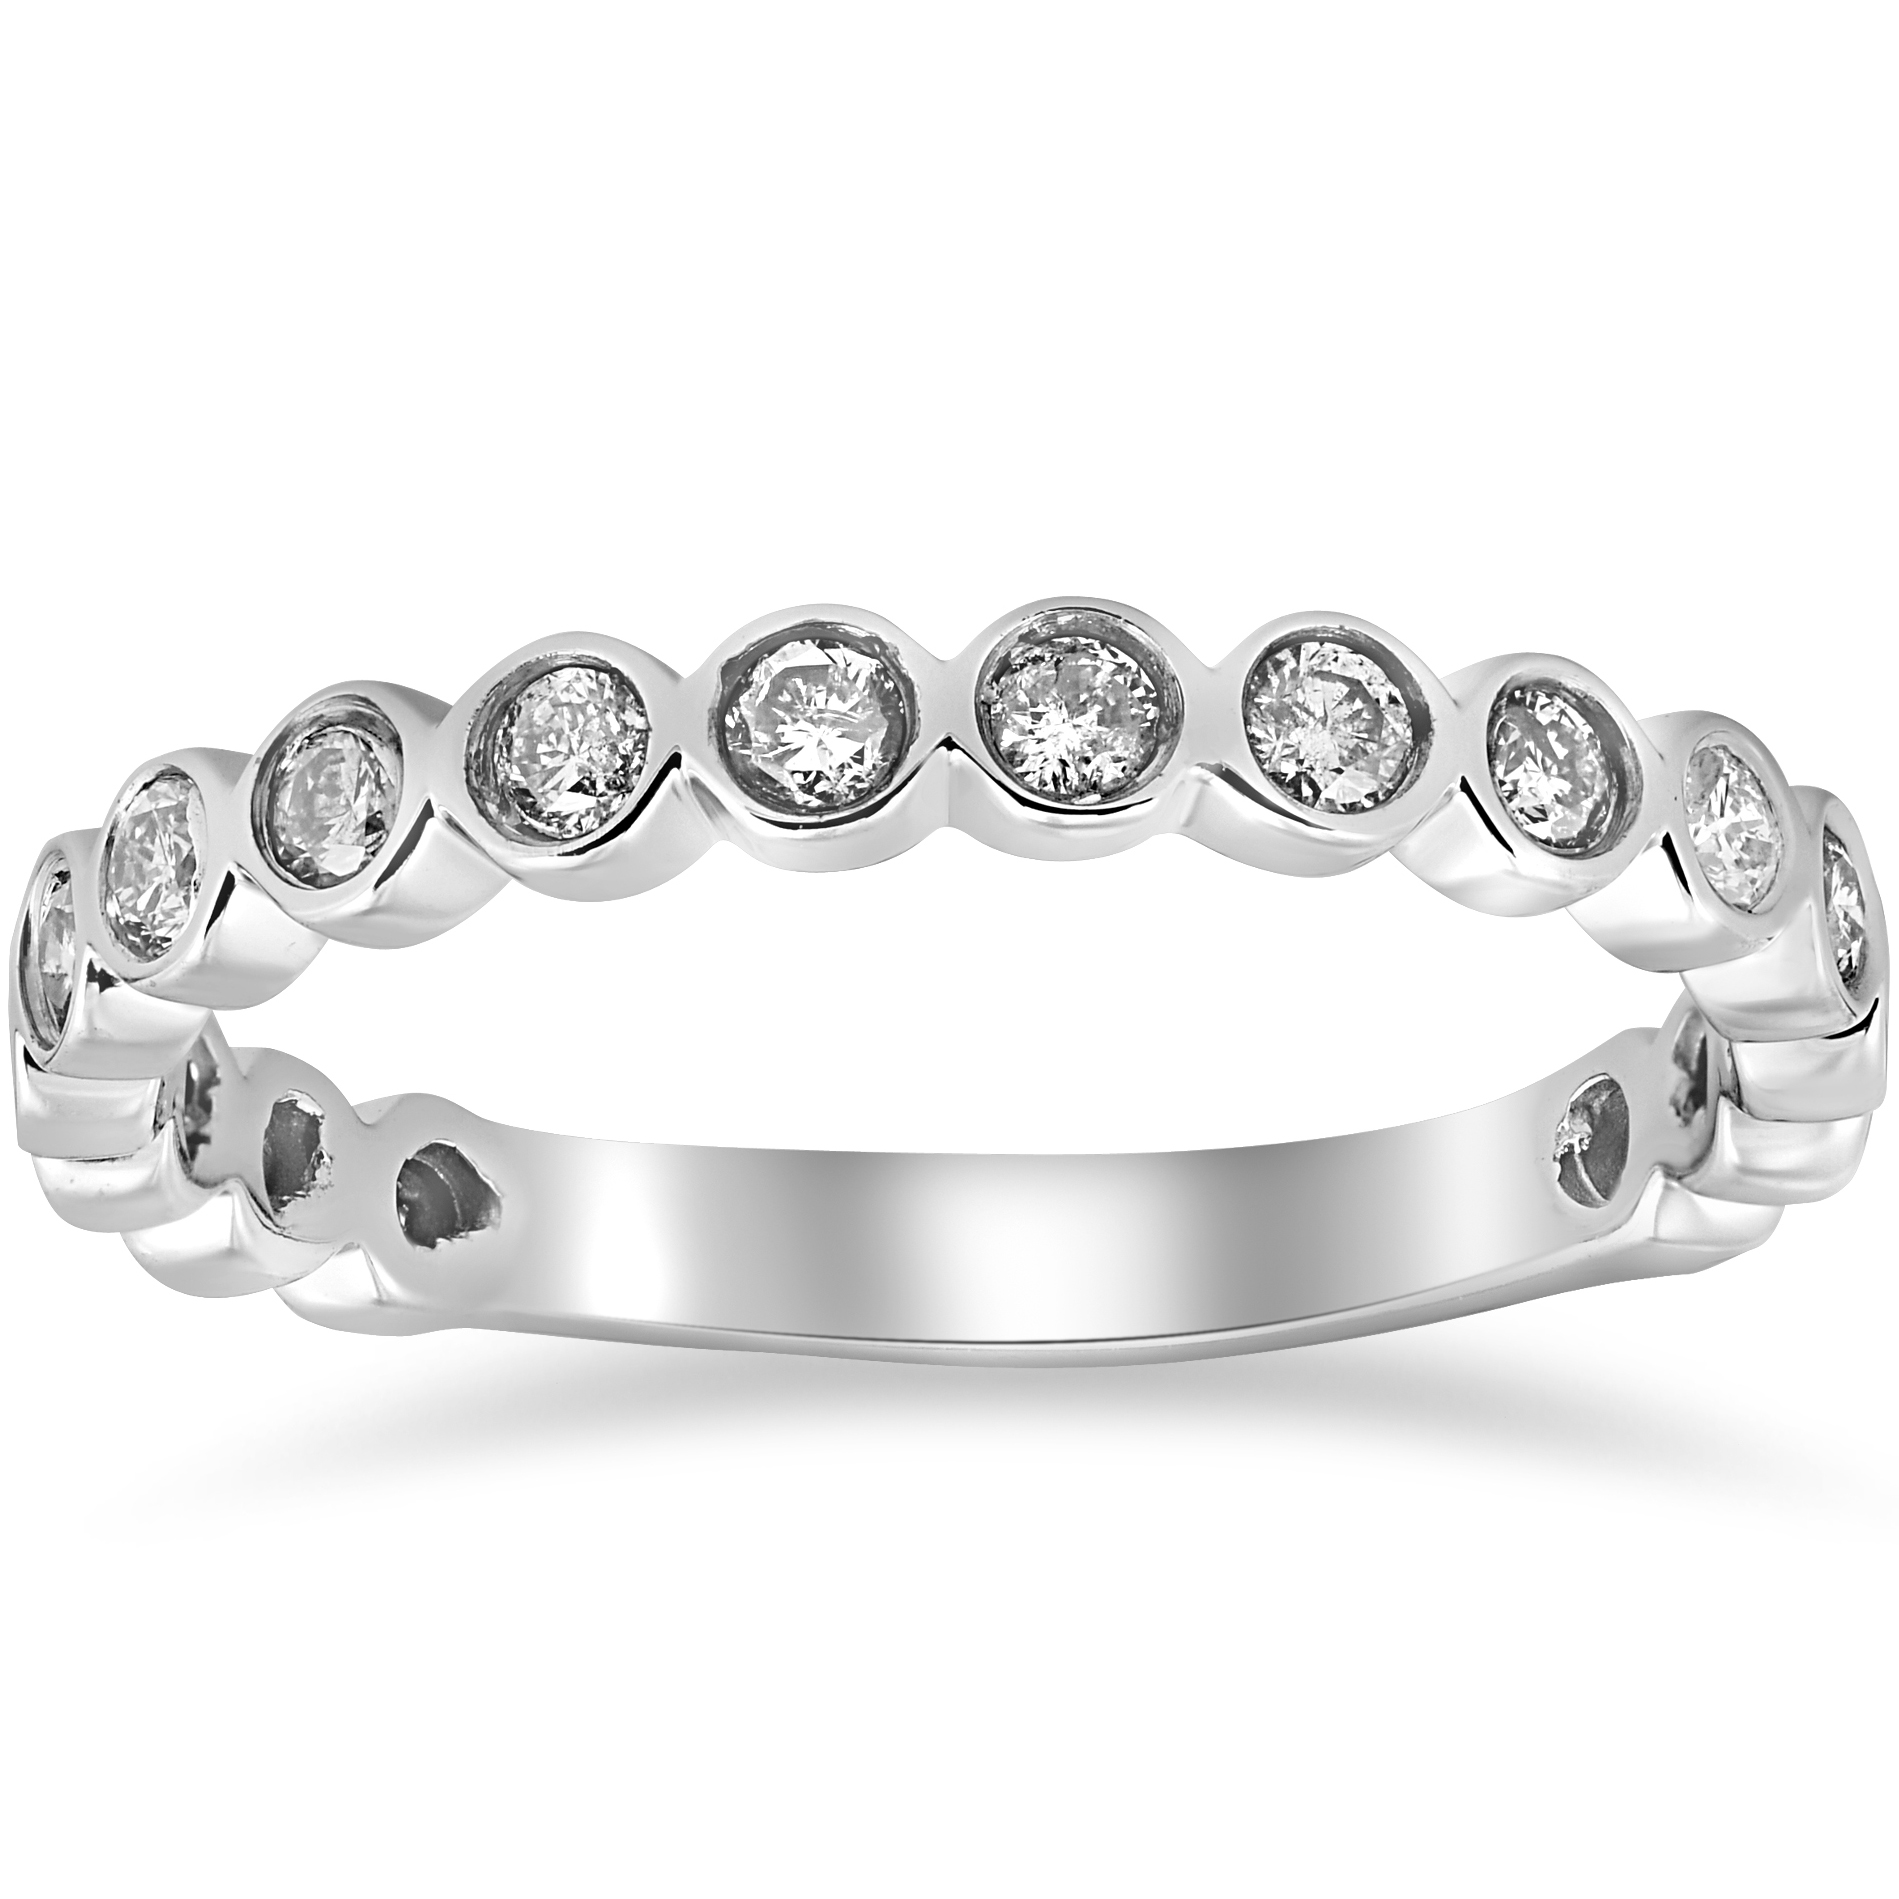 1 2ct stackable bezel diamond wedding ring 14k white gold anniversary band ebay. Black Bedroom Furniture Sets. Home Design Ideas